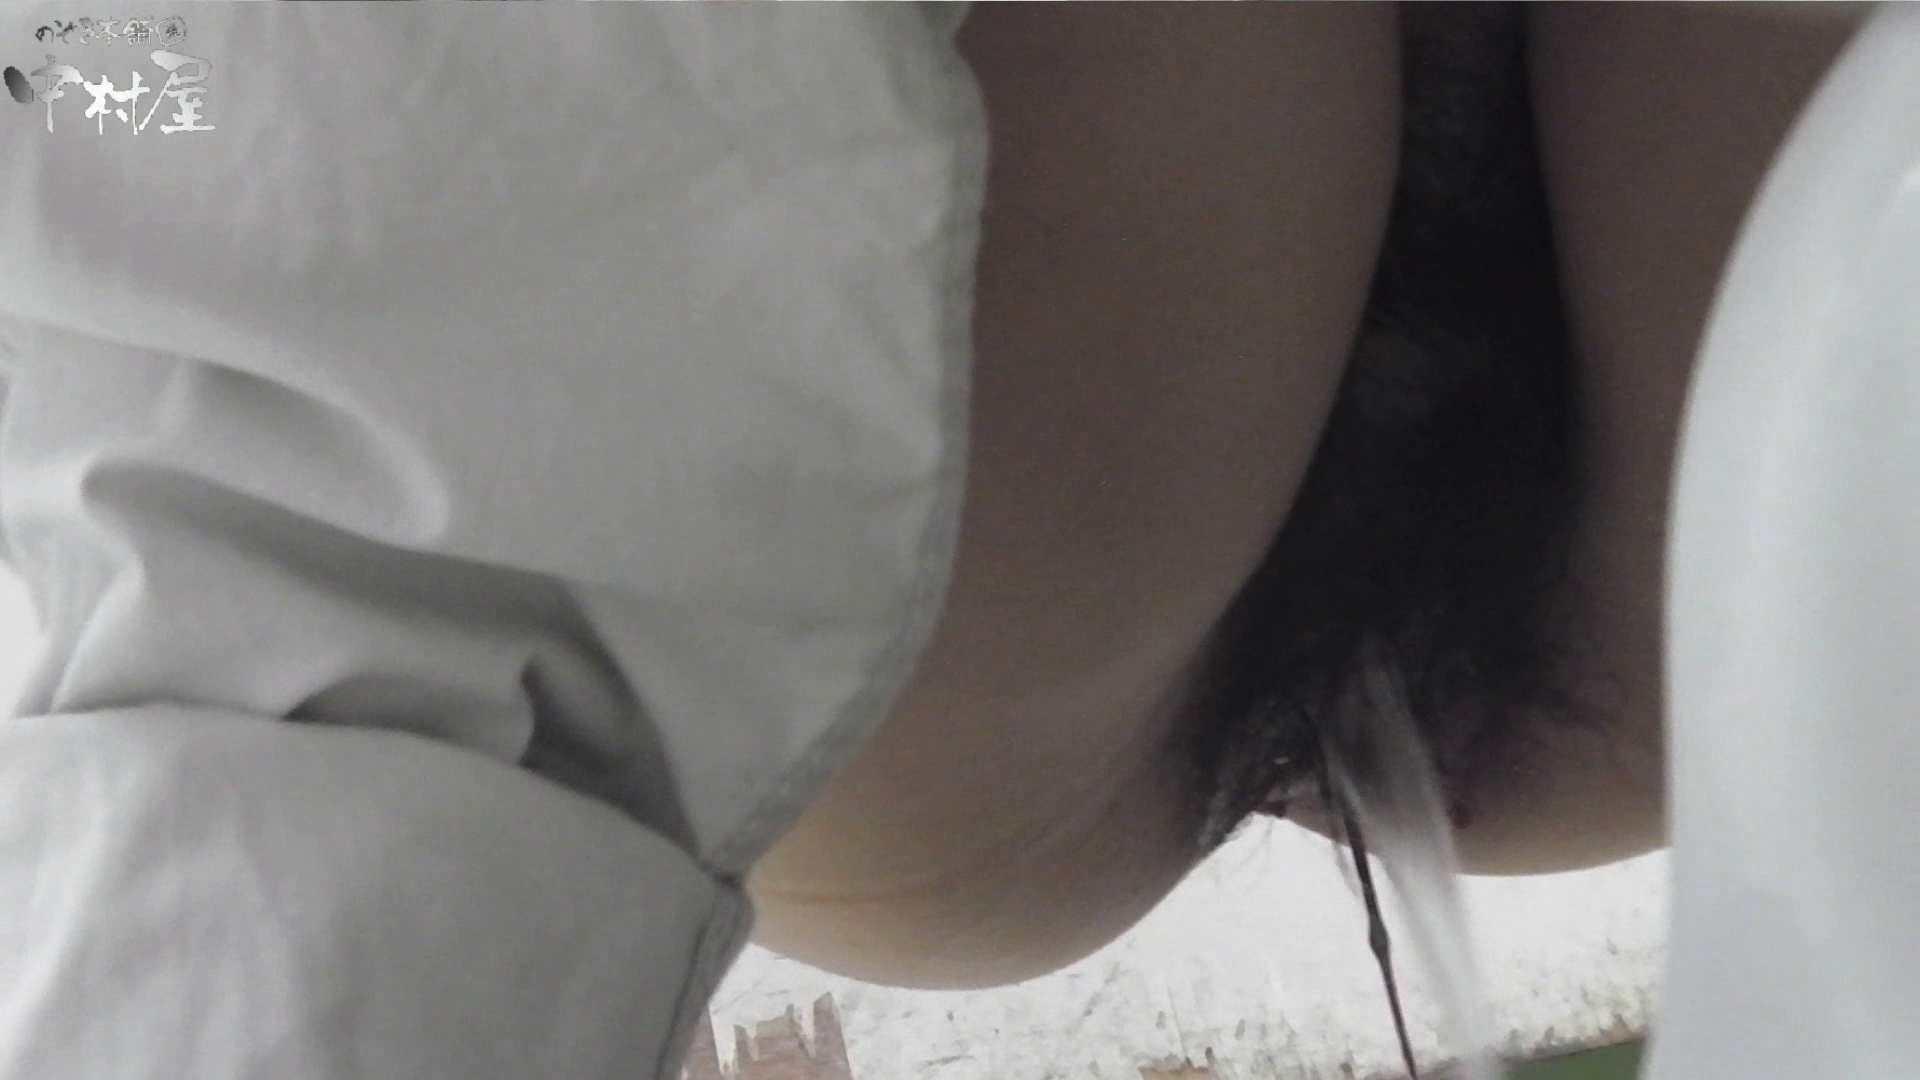 vol.38 命がけ潜伏洗面所! 巨乳さん・固め・推定200g 潜入 おめこ無修正動画無料 88PIX 38